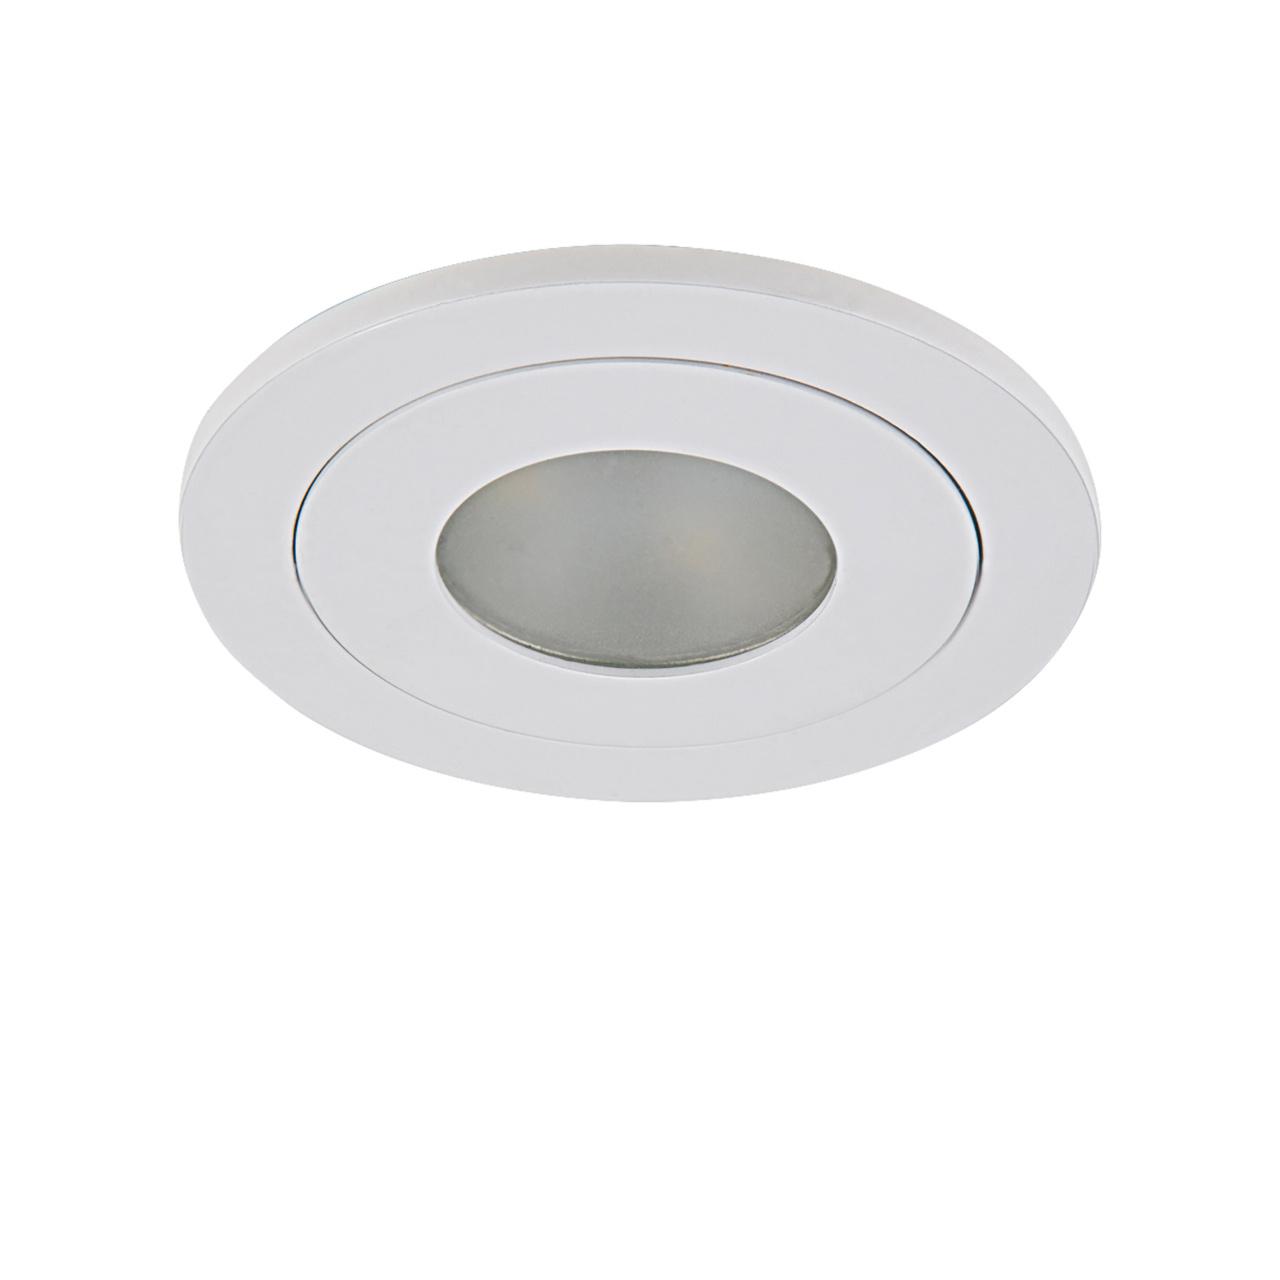 Светильник Leddy cyl LED 3W 240LM белый 3000K Lightstar 212175